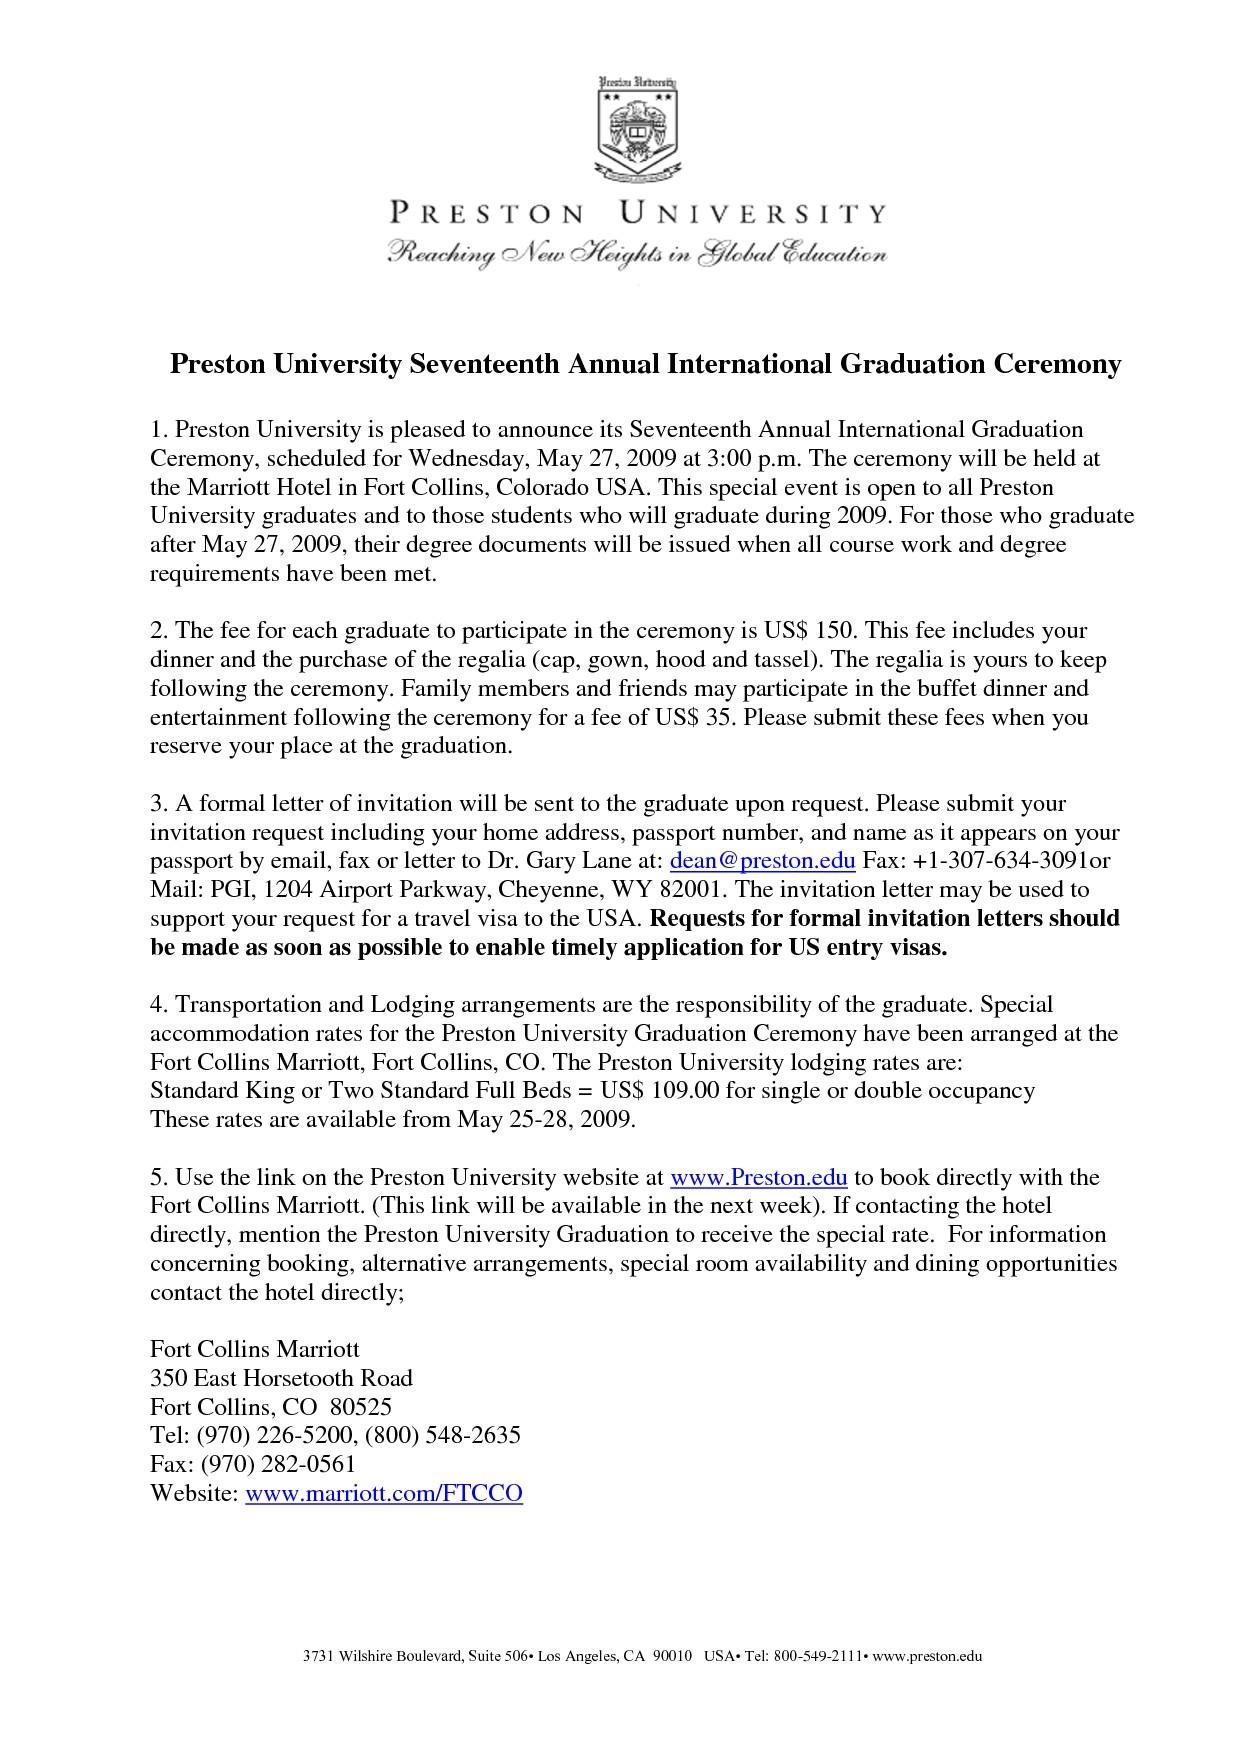 Graduation Invitation Letter Sample Graduation Invitation Examples